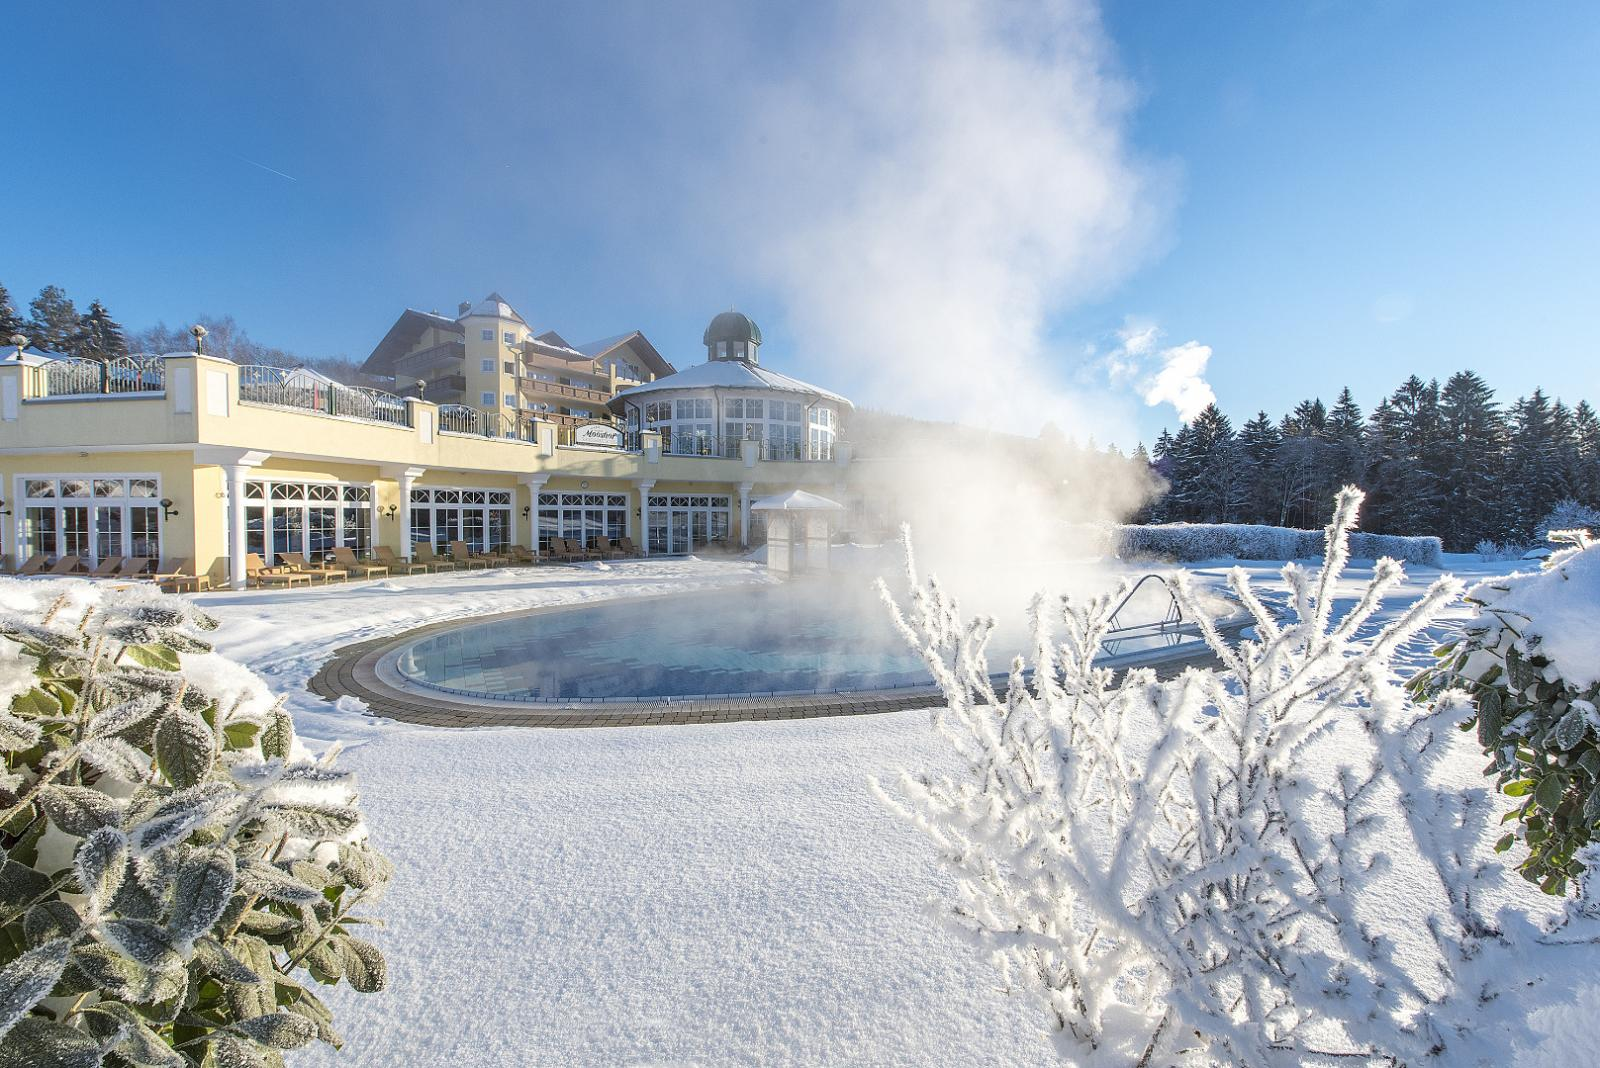 Ginseng: Foto vom Wellnesshotel Wellness & Spa Resort Mooshof   Wellness Bayern